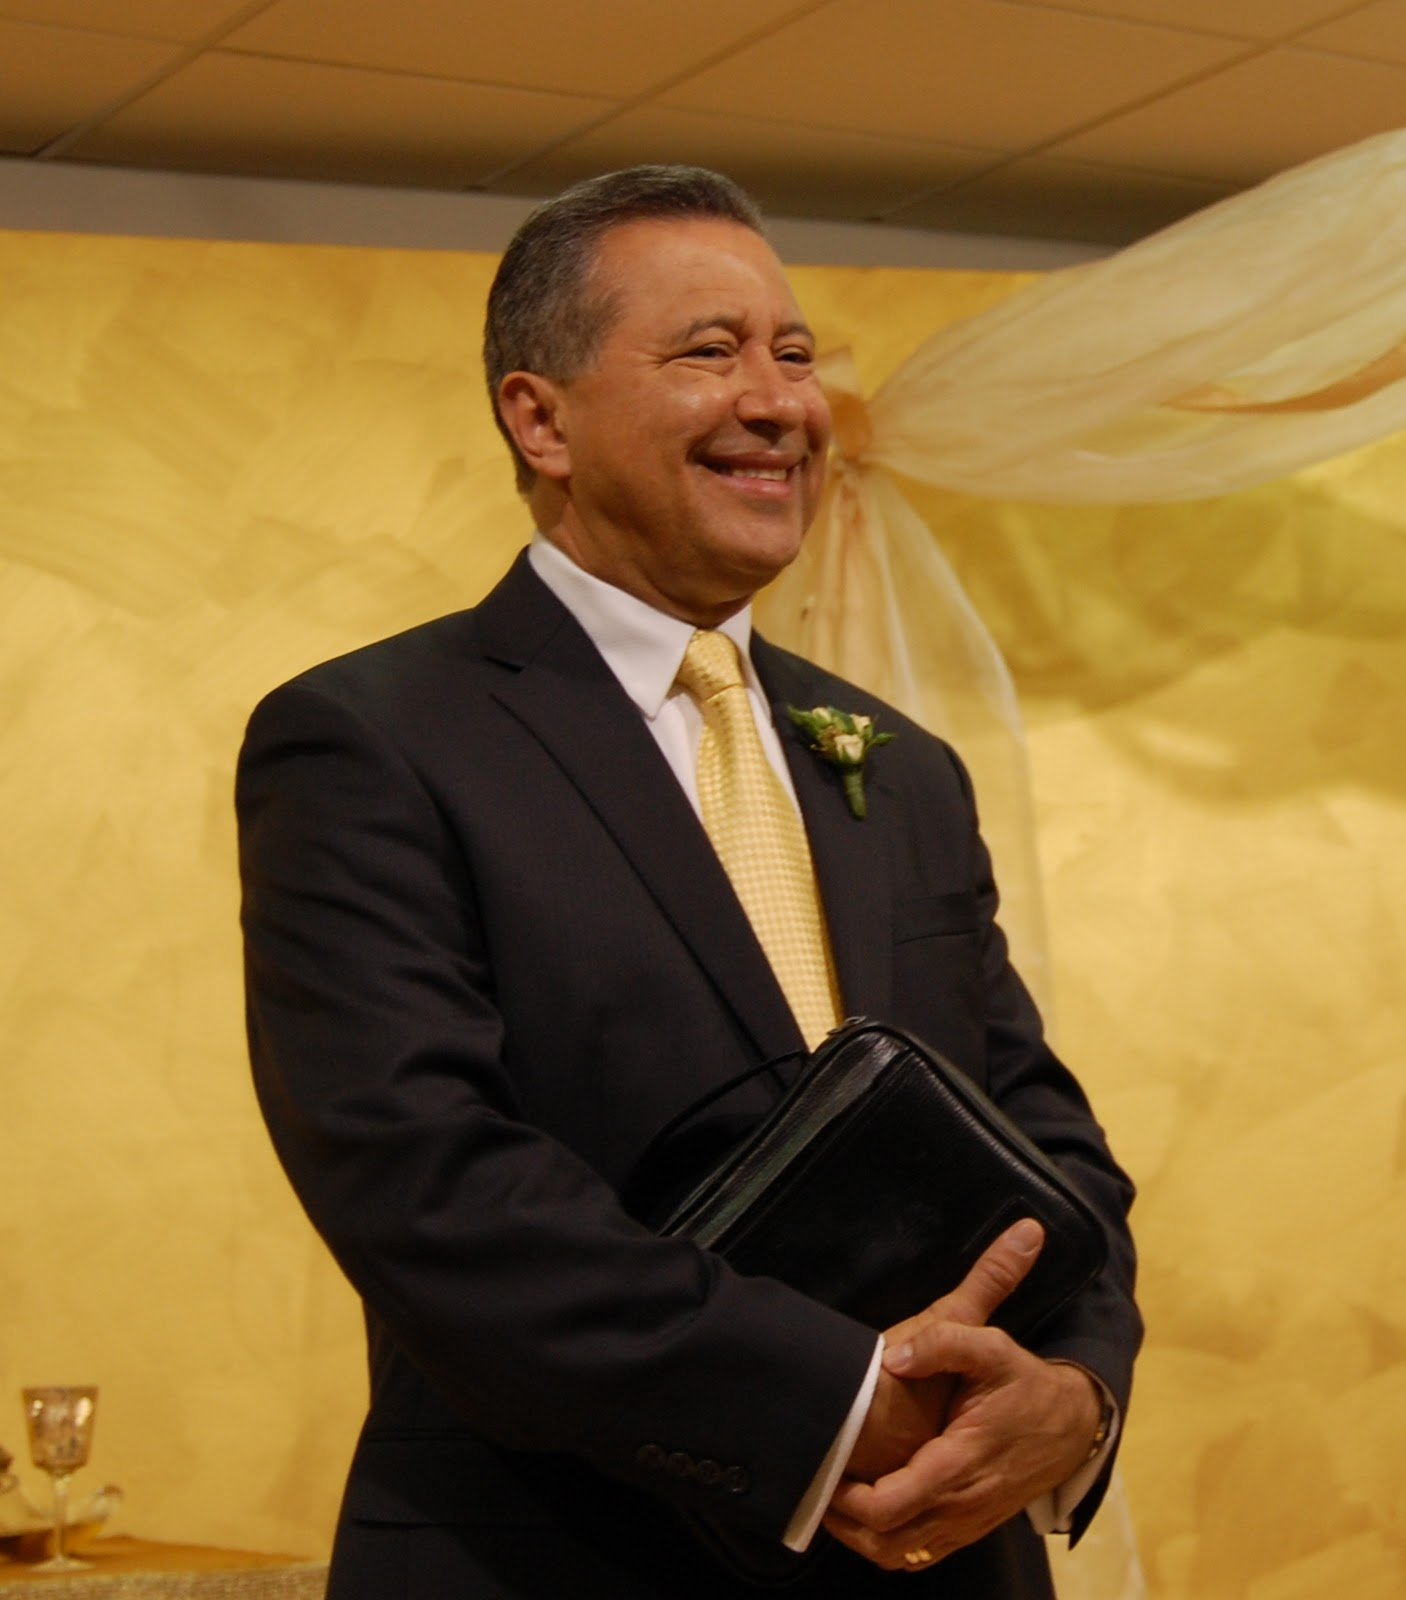 Pastor Radhames Fernandez